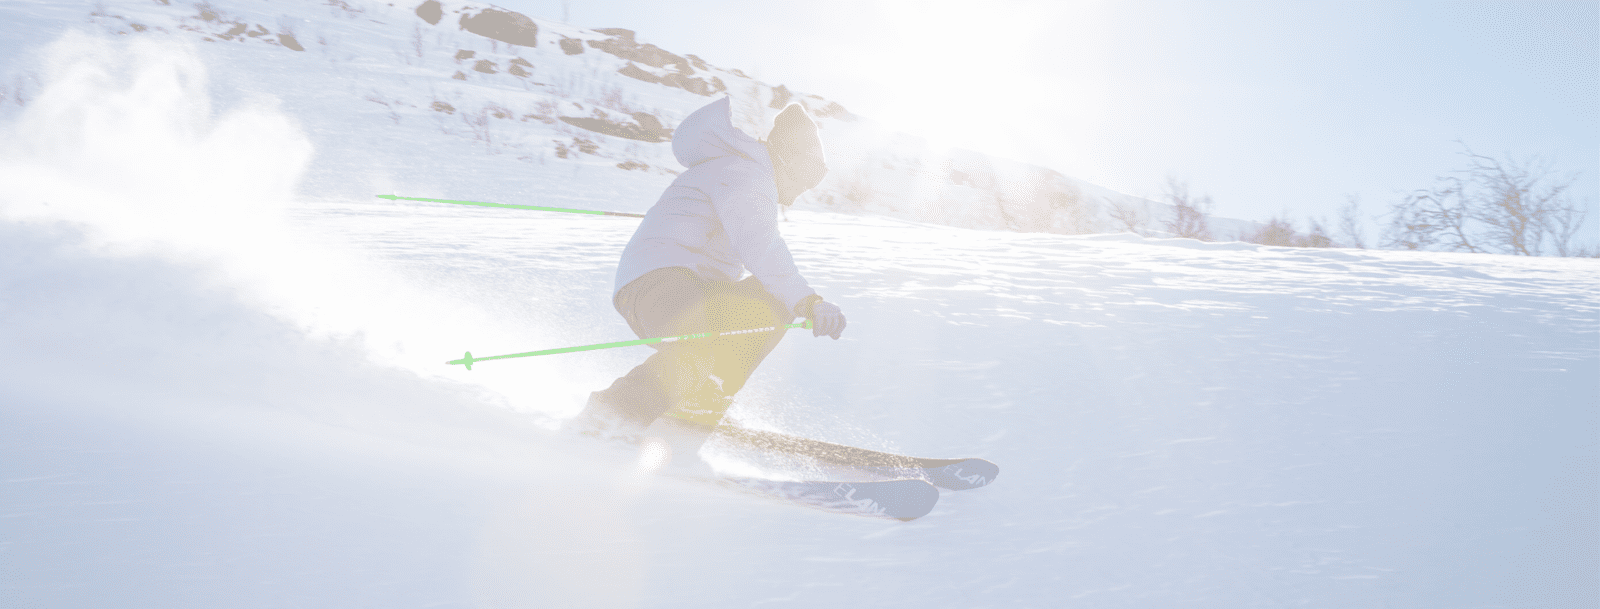 Ski Lifts - Airport Transfers to Ski Resorts